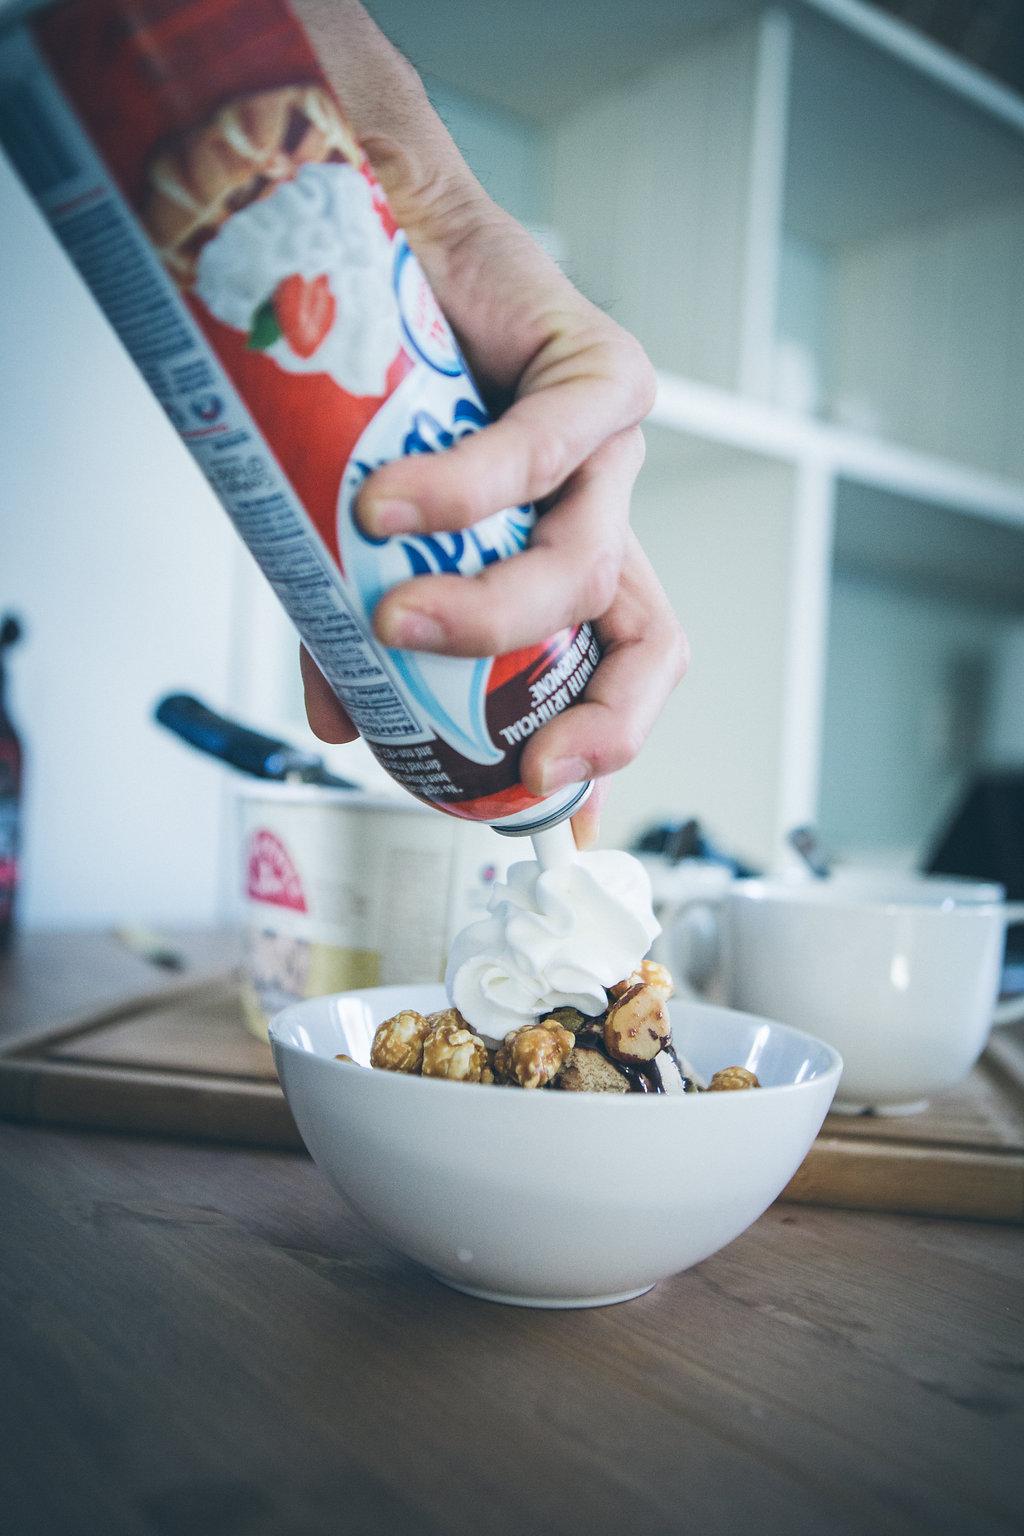 desert with whipped cream